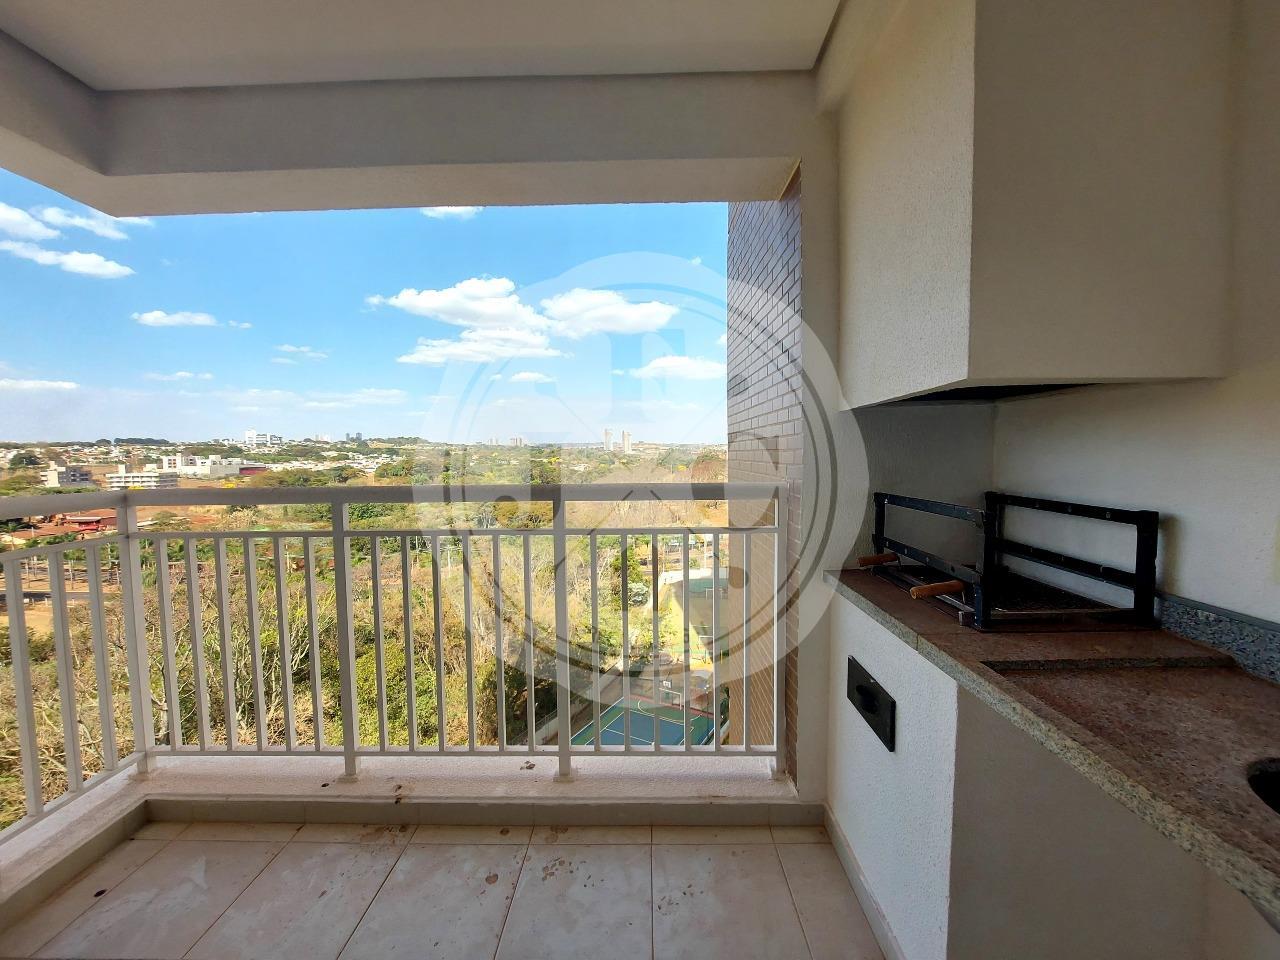 Apartamento para aluguel no Vila do Golf: Sacada